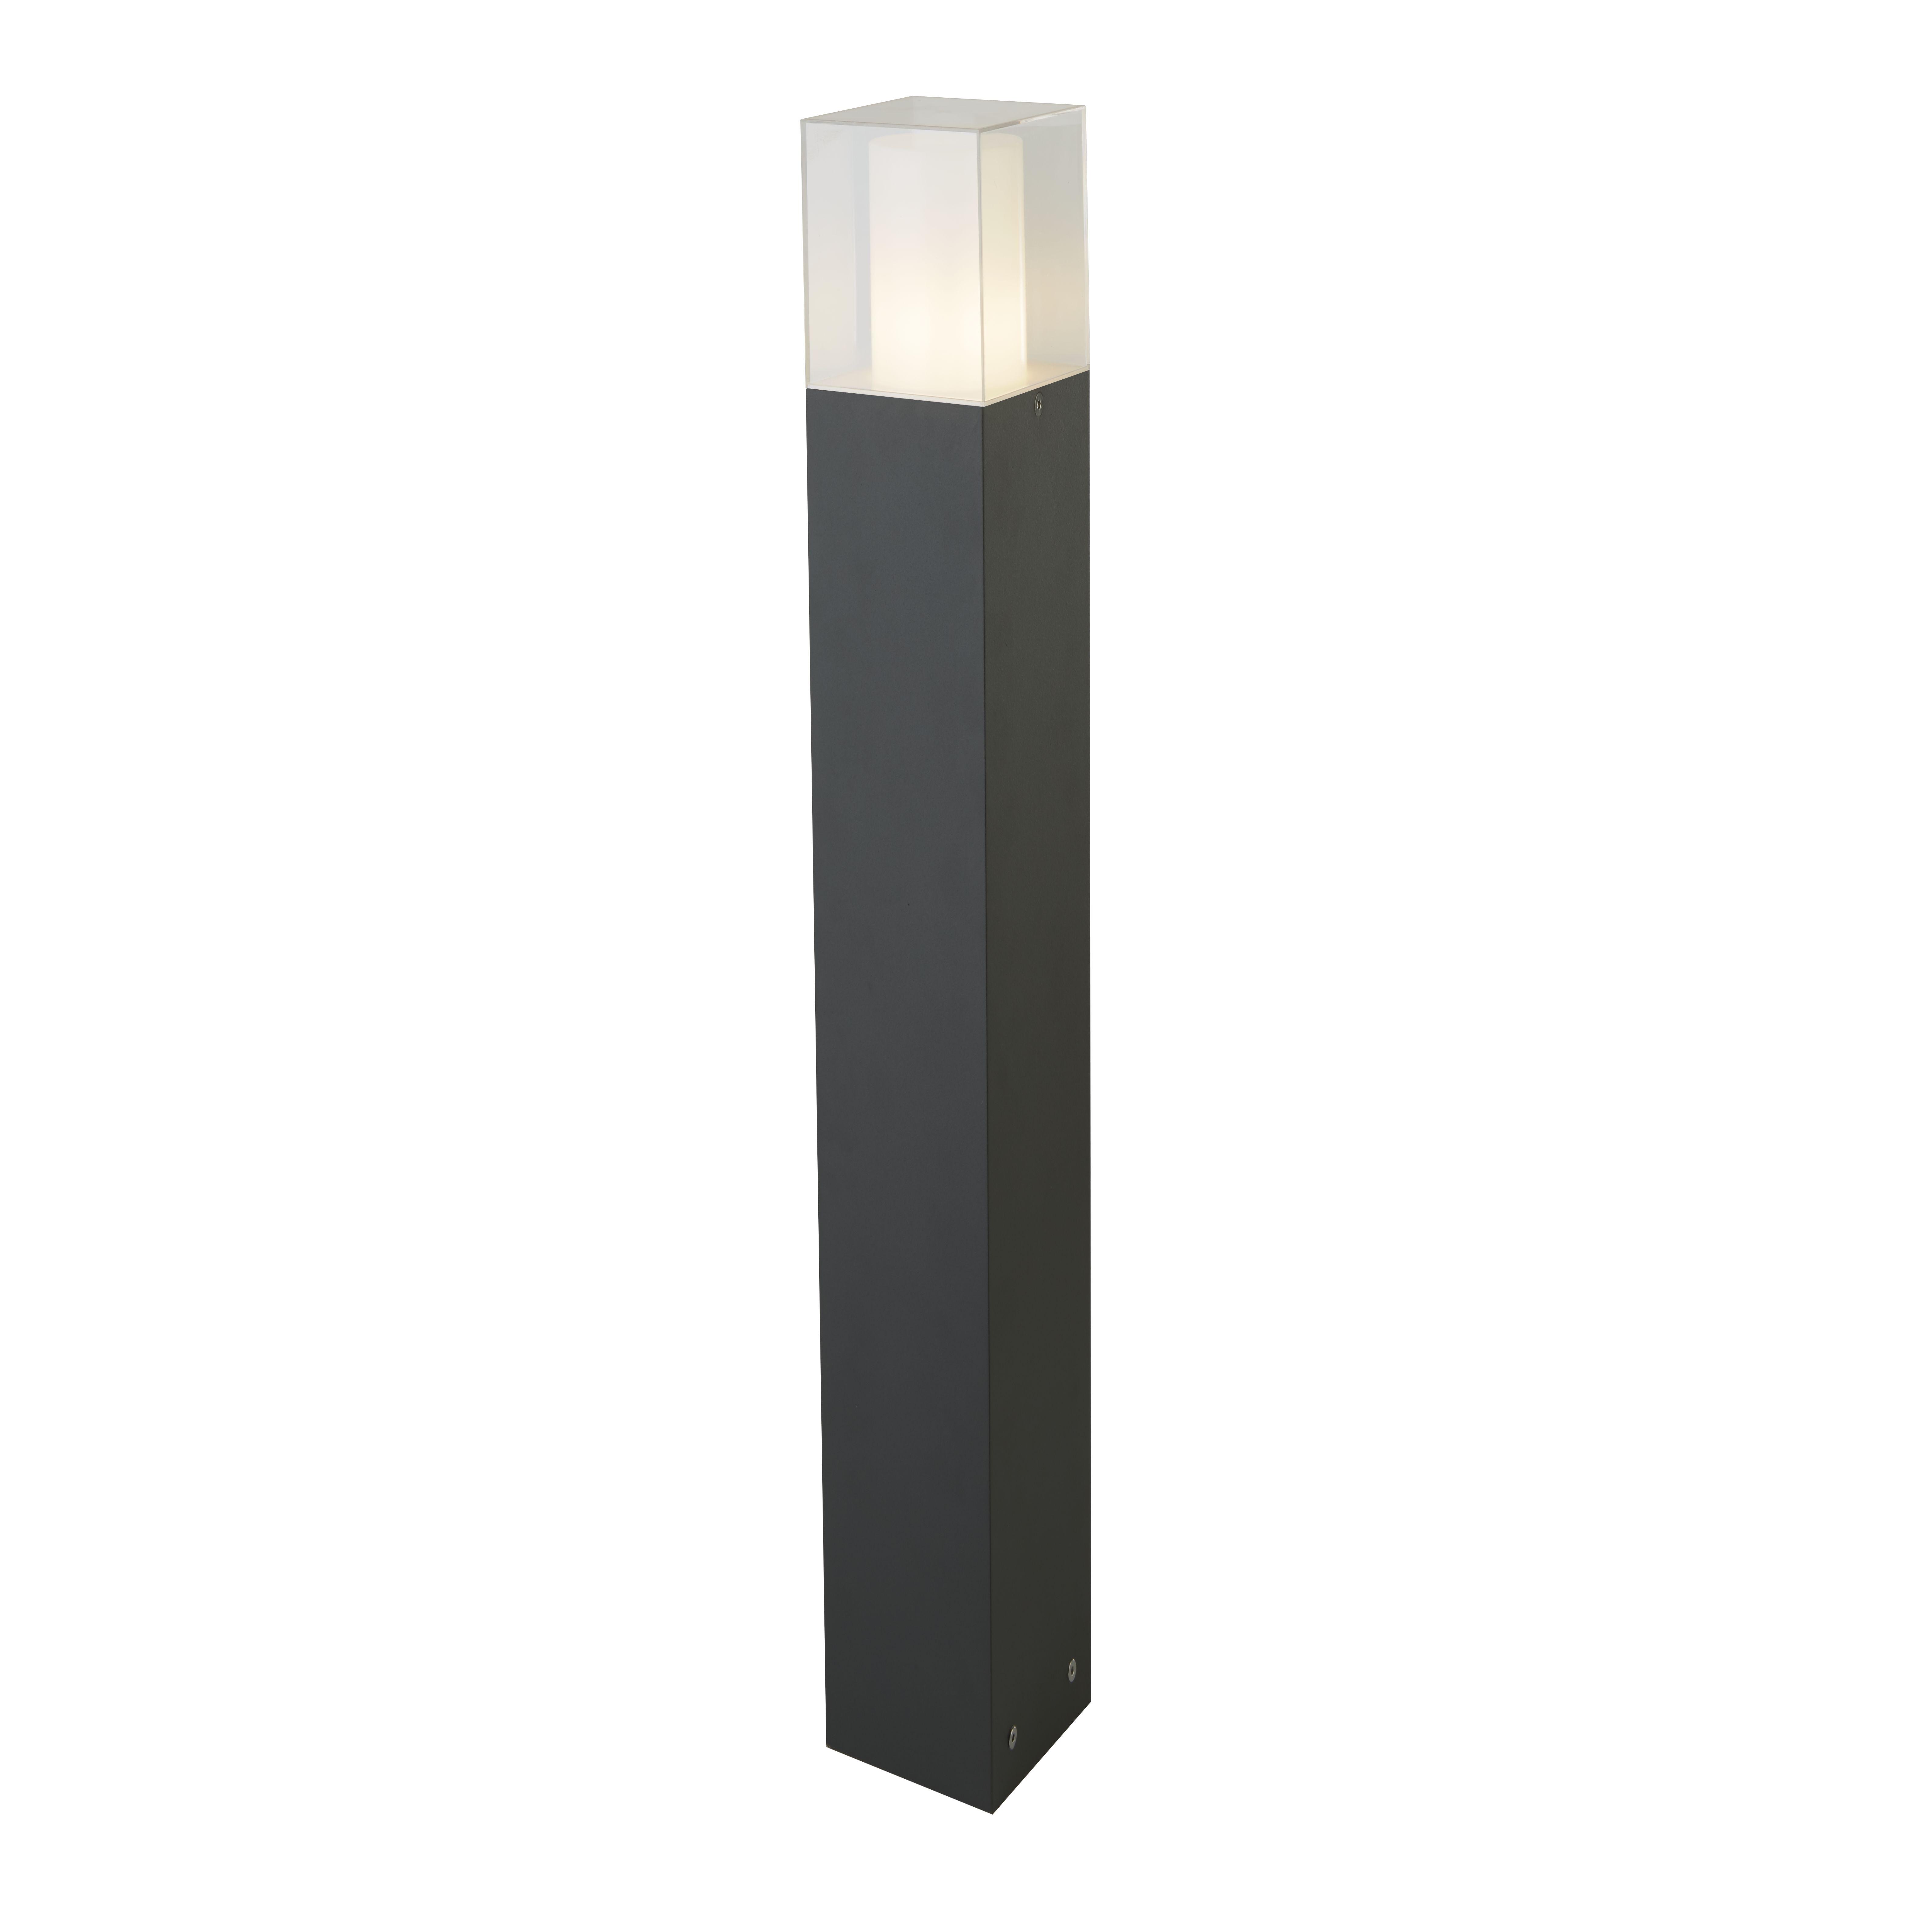 Square Outdoor Post, 900cm, Dark Grey/white